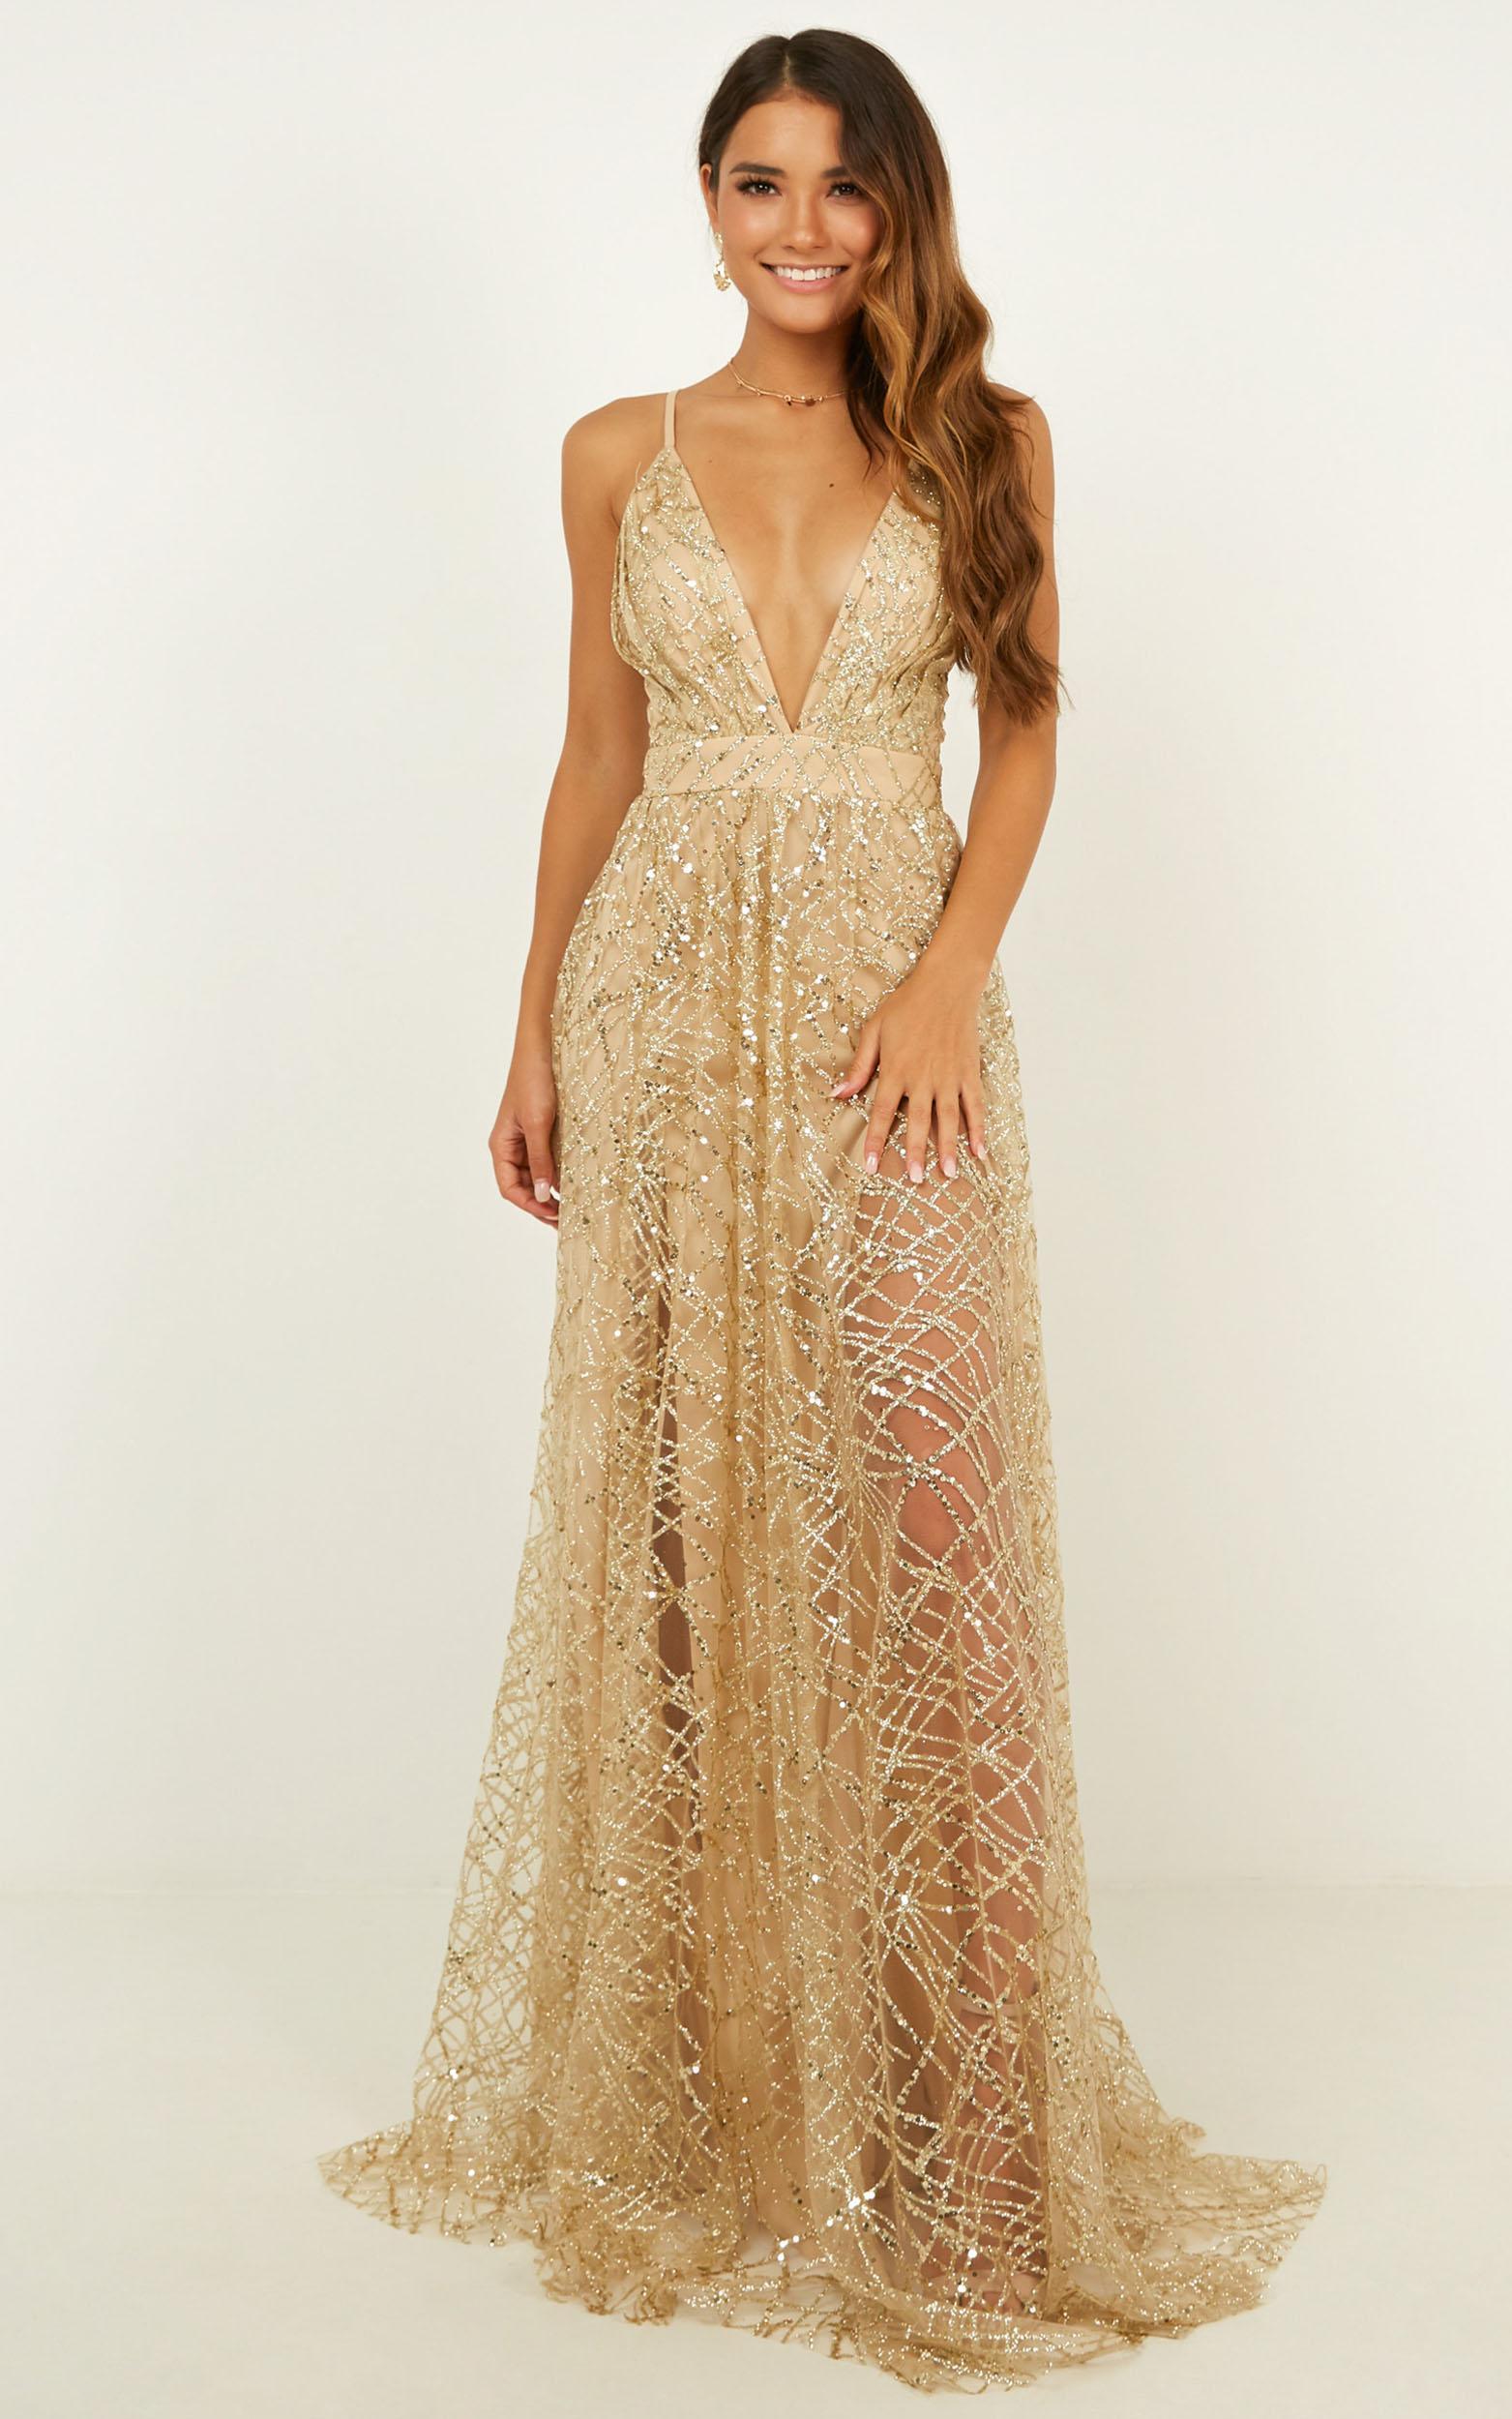 Eternal Sunshine Maxi Dress In Gold Sequin - 14 (XL), Gold, hi-res image number null